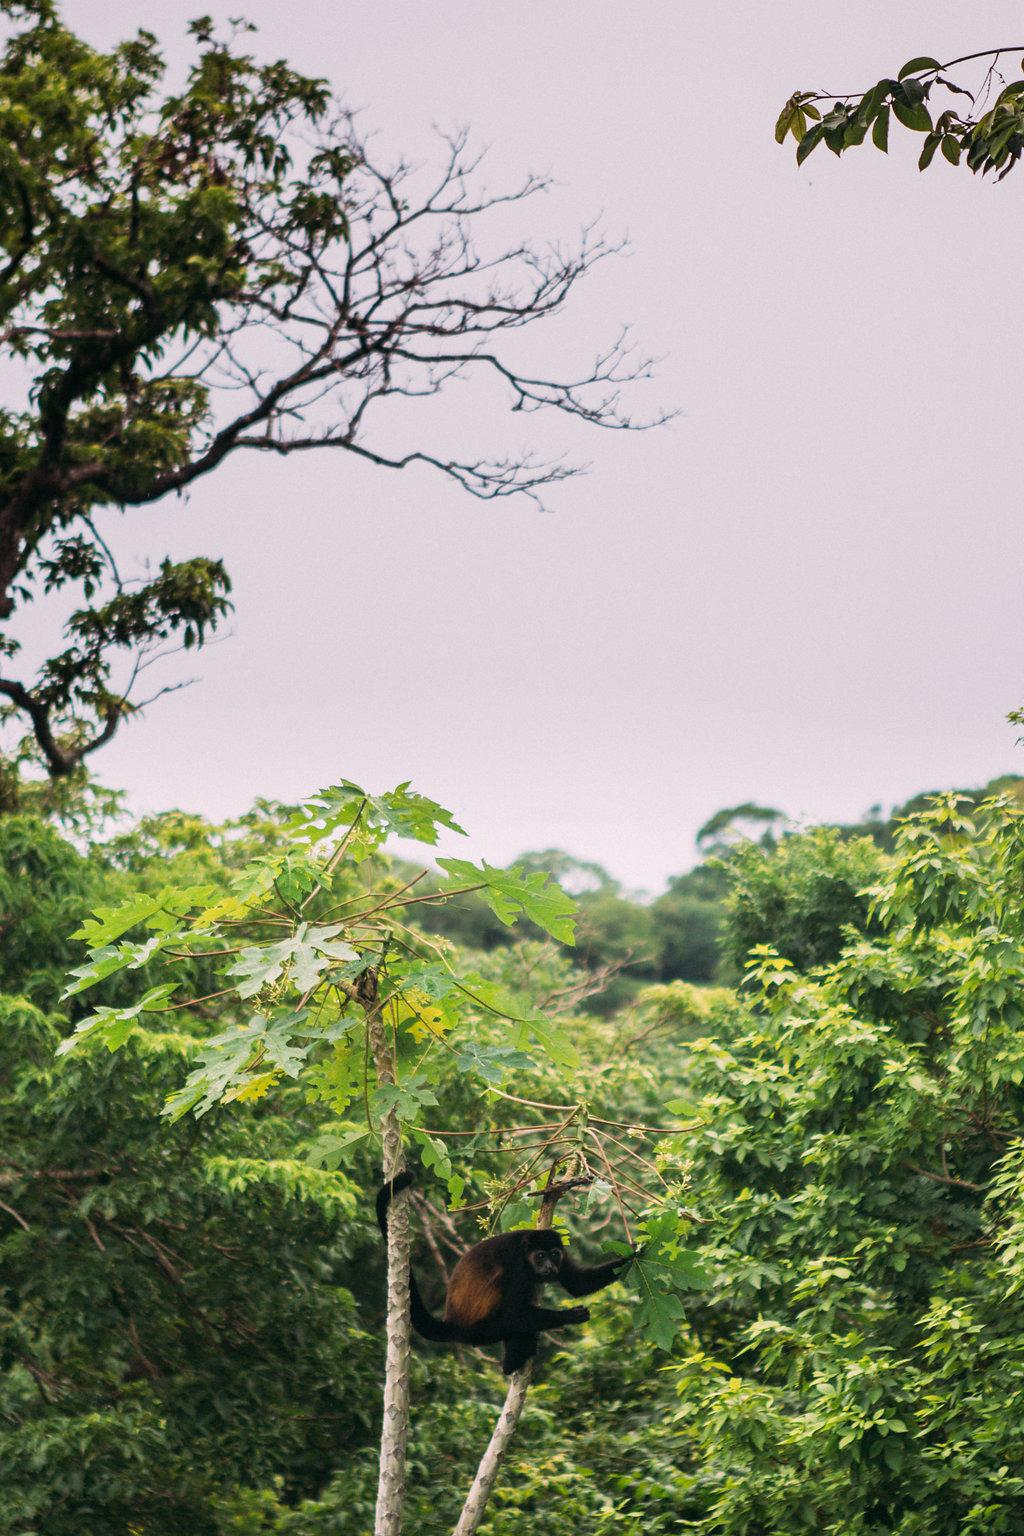 san-juan-del-sur-nicaragua-monkey.jpg